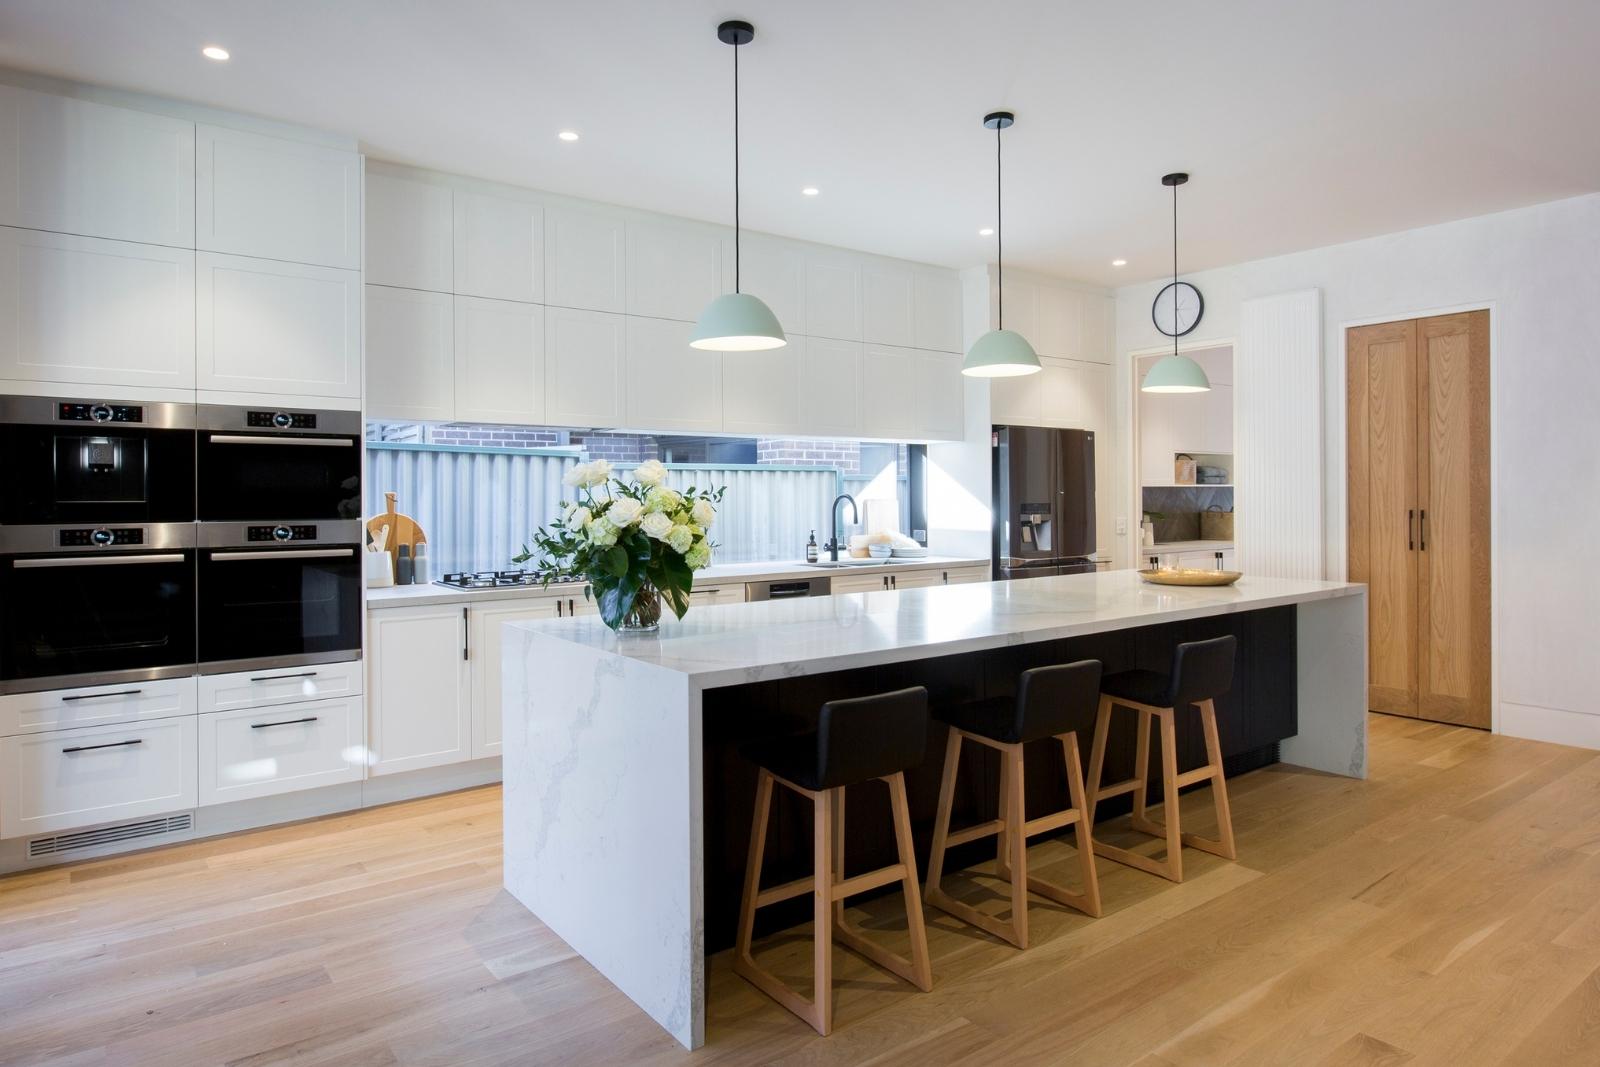 Galley Kitchen with Island Bench - Freedom Kitchens